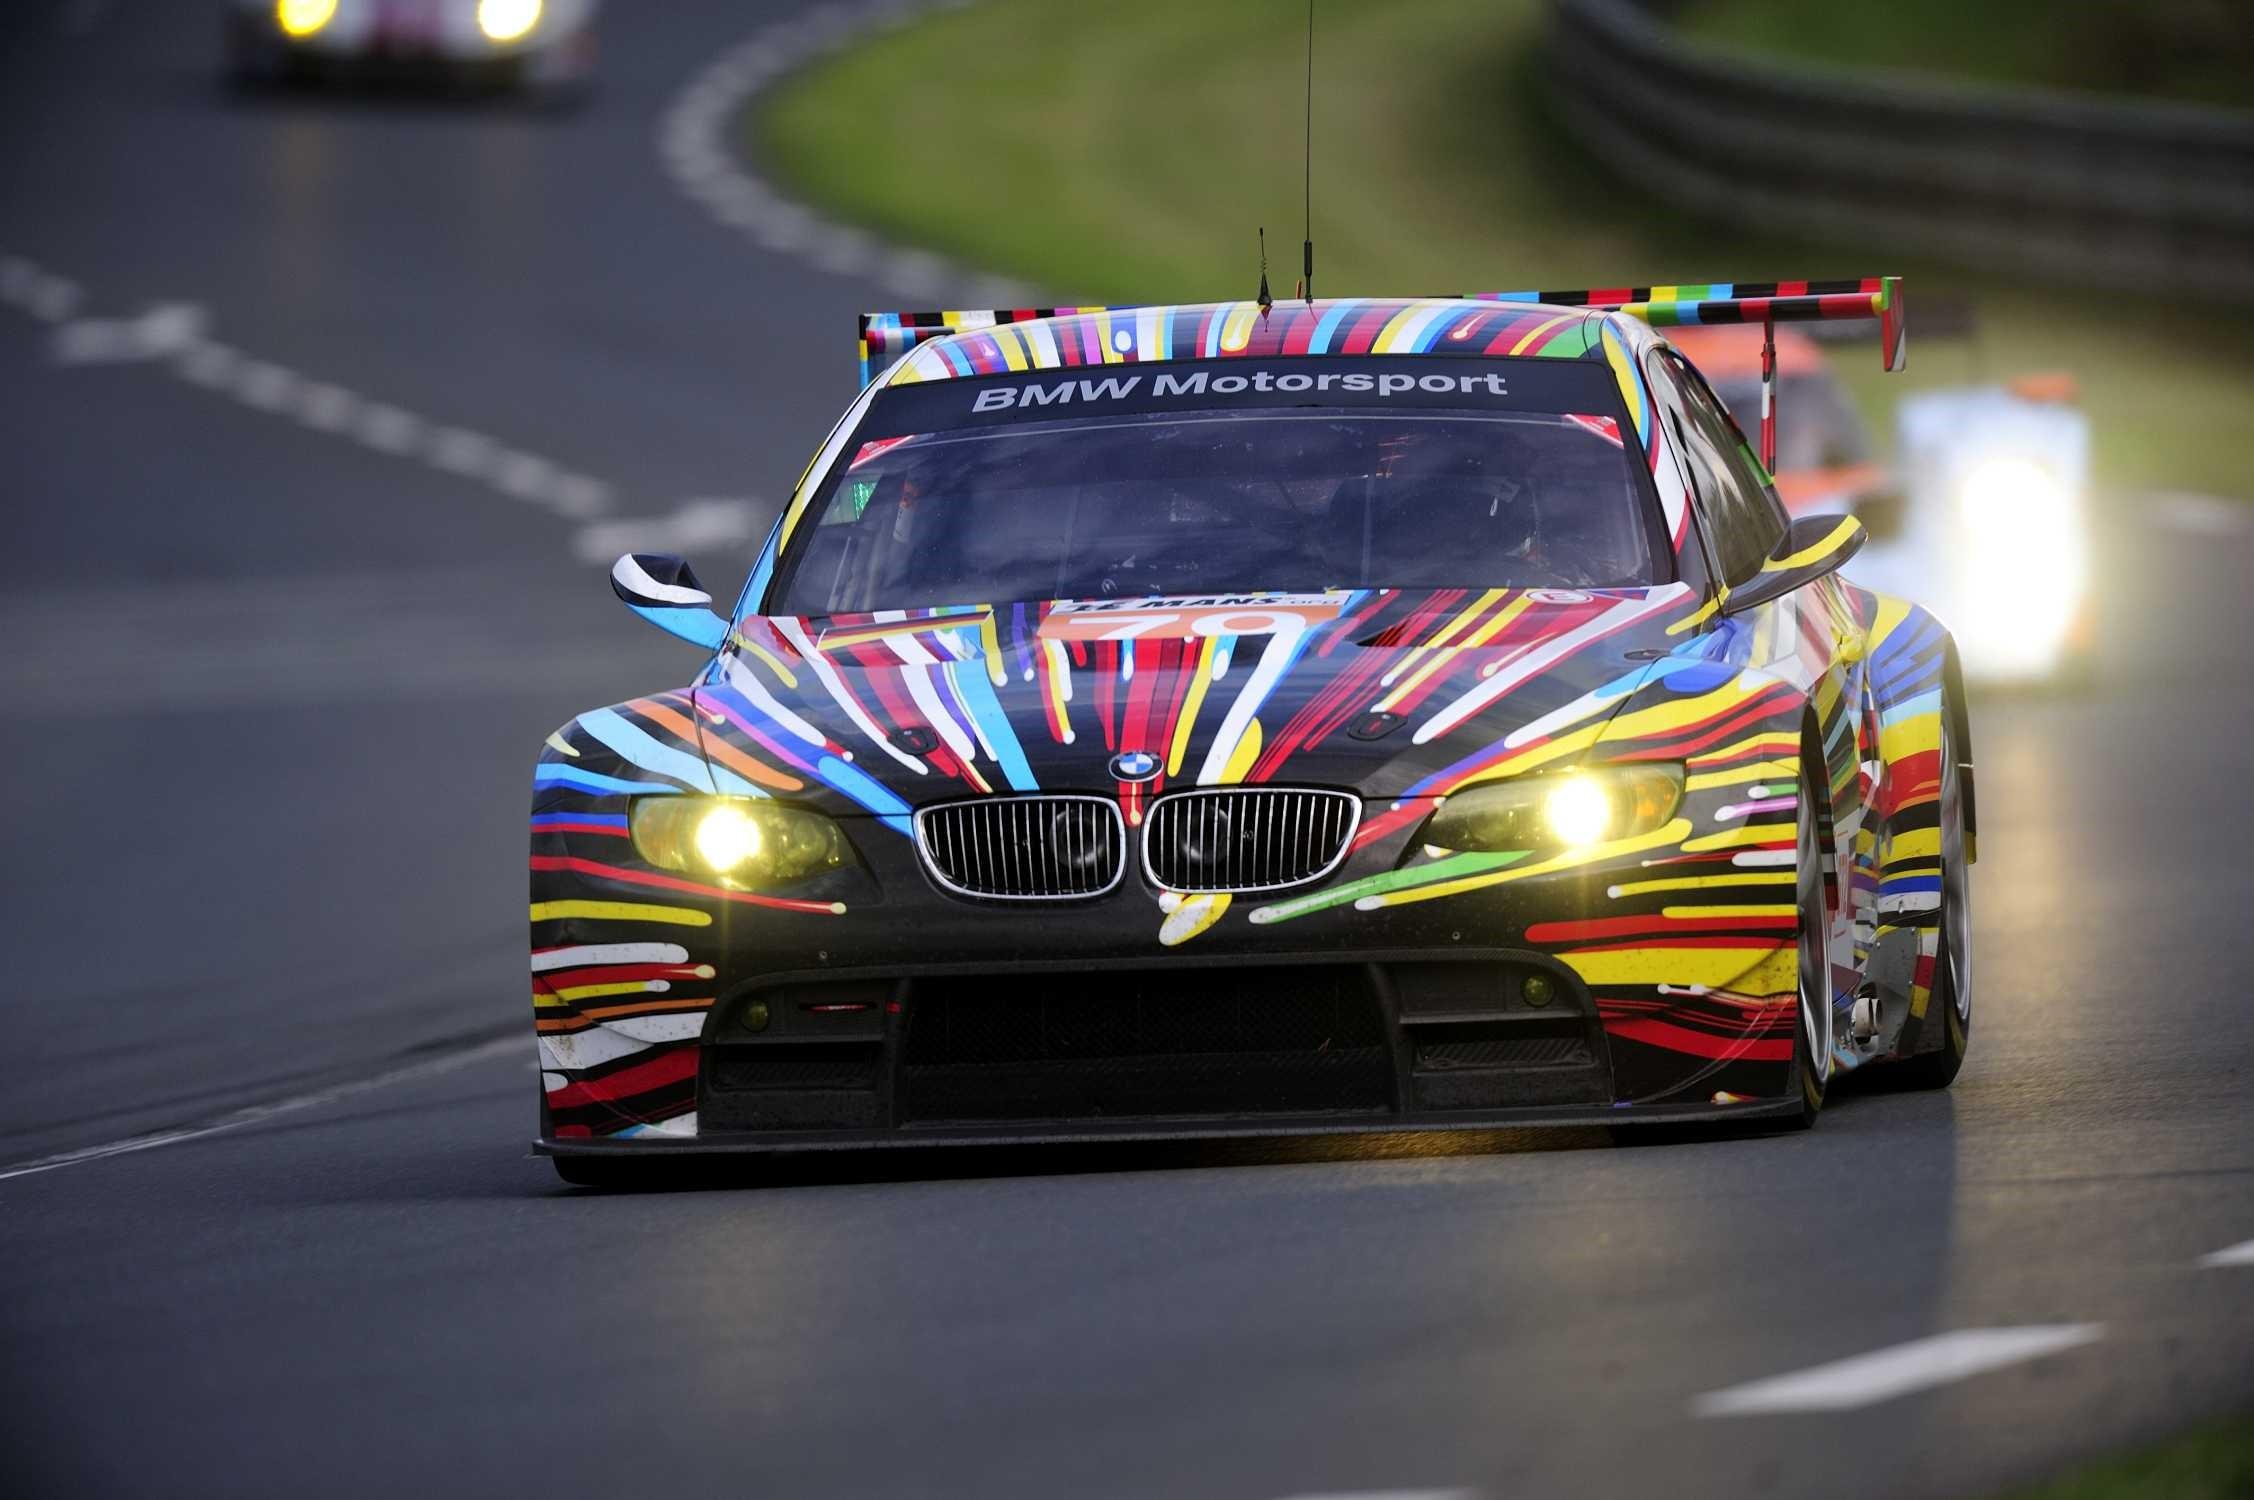 3. 2010 Jeff Koons M3 GT2